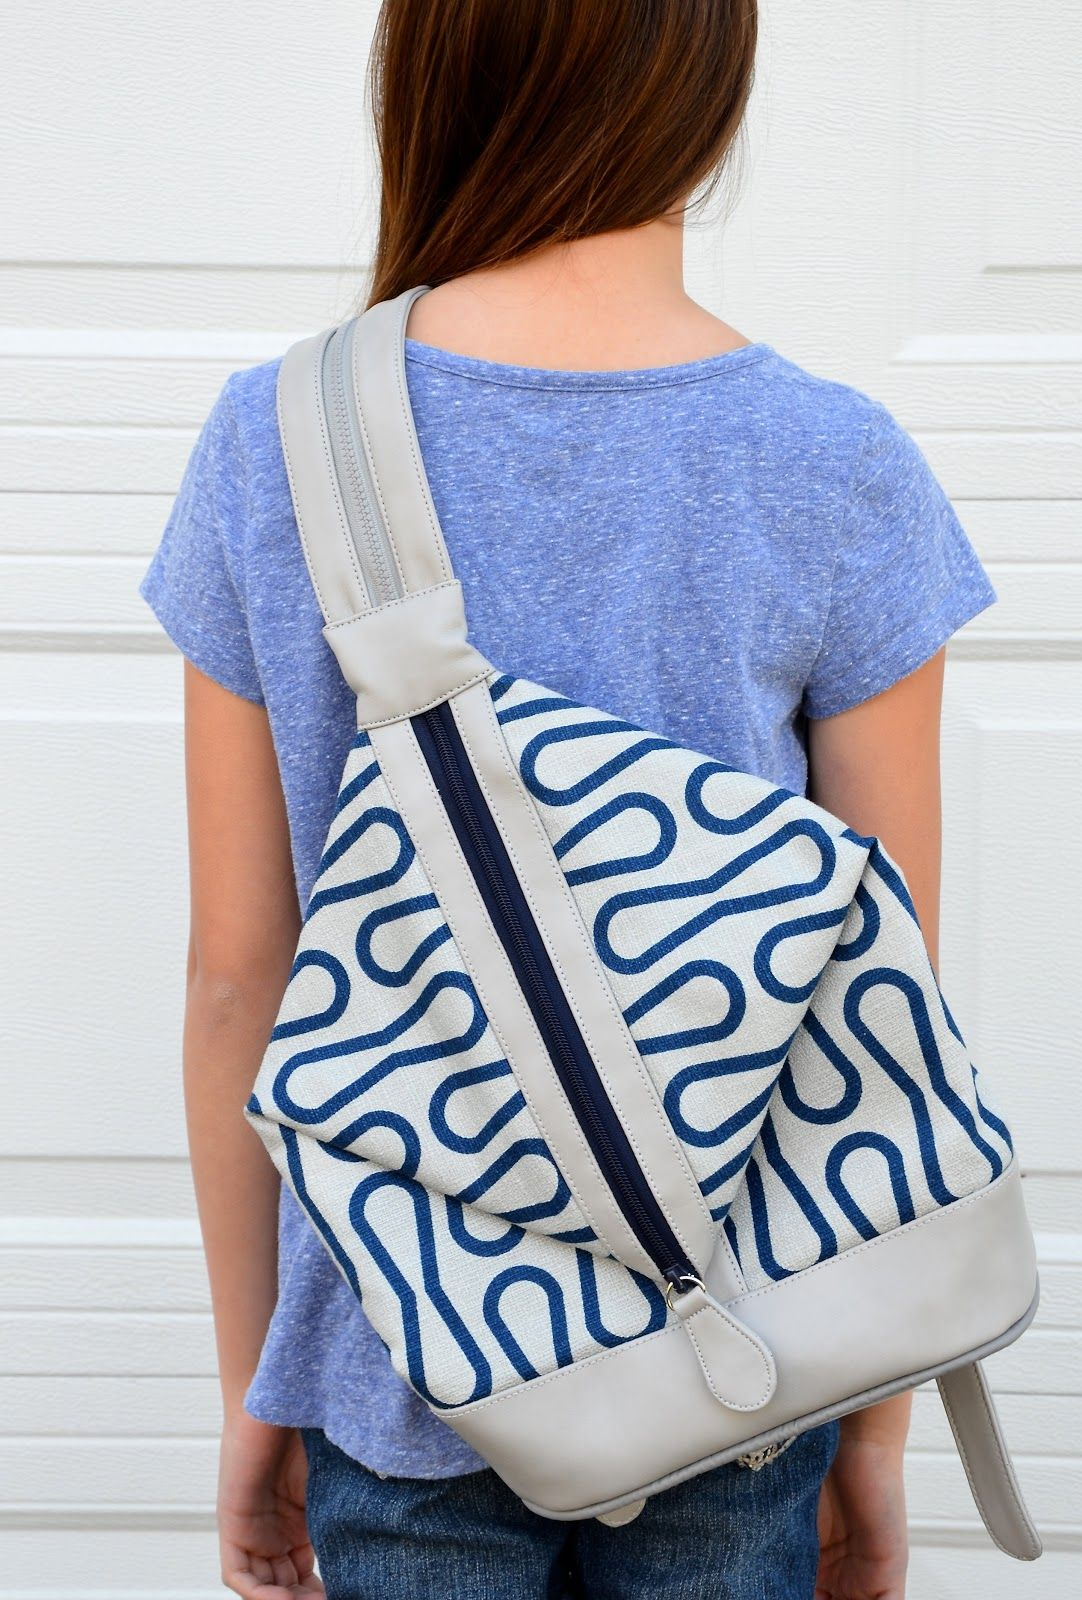 Ikat Bag\'s 3-way bag design, including strap that splits in half to ...